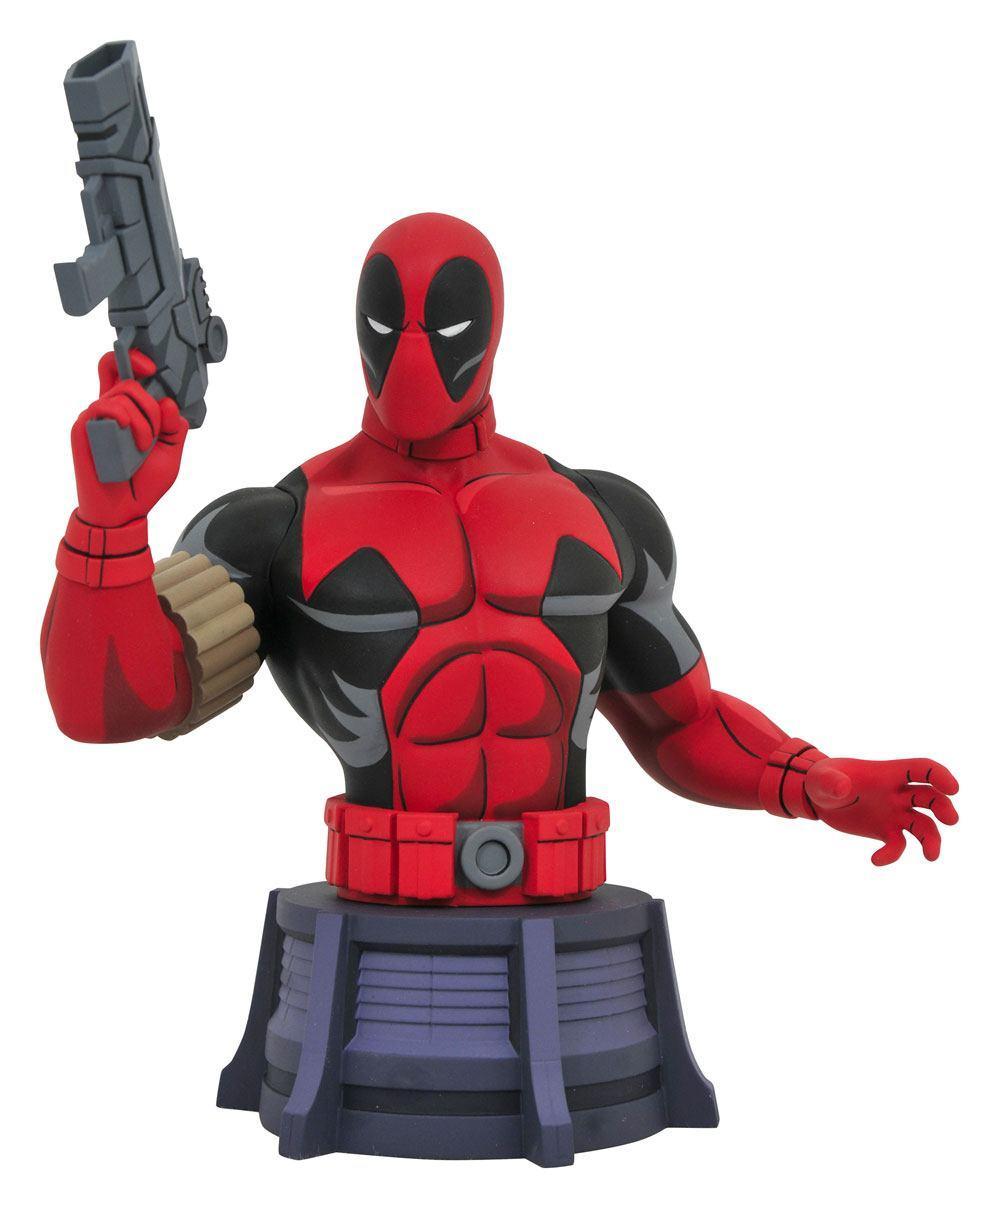 MARVEL - Animated X-Men Deadpool - Buste 16cm_1